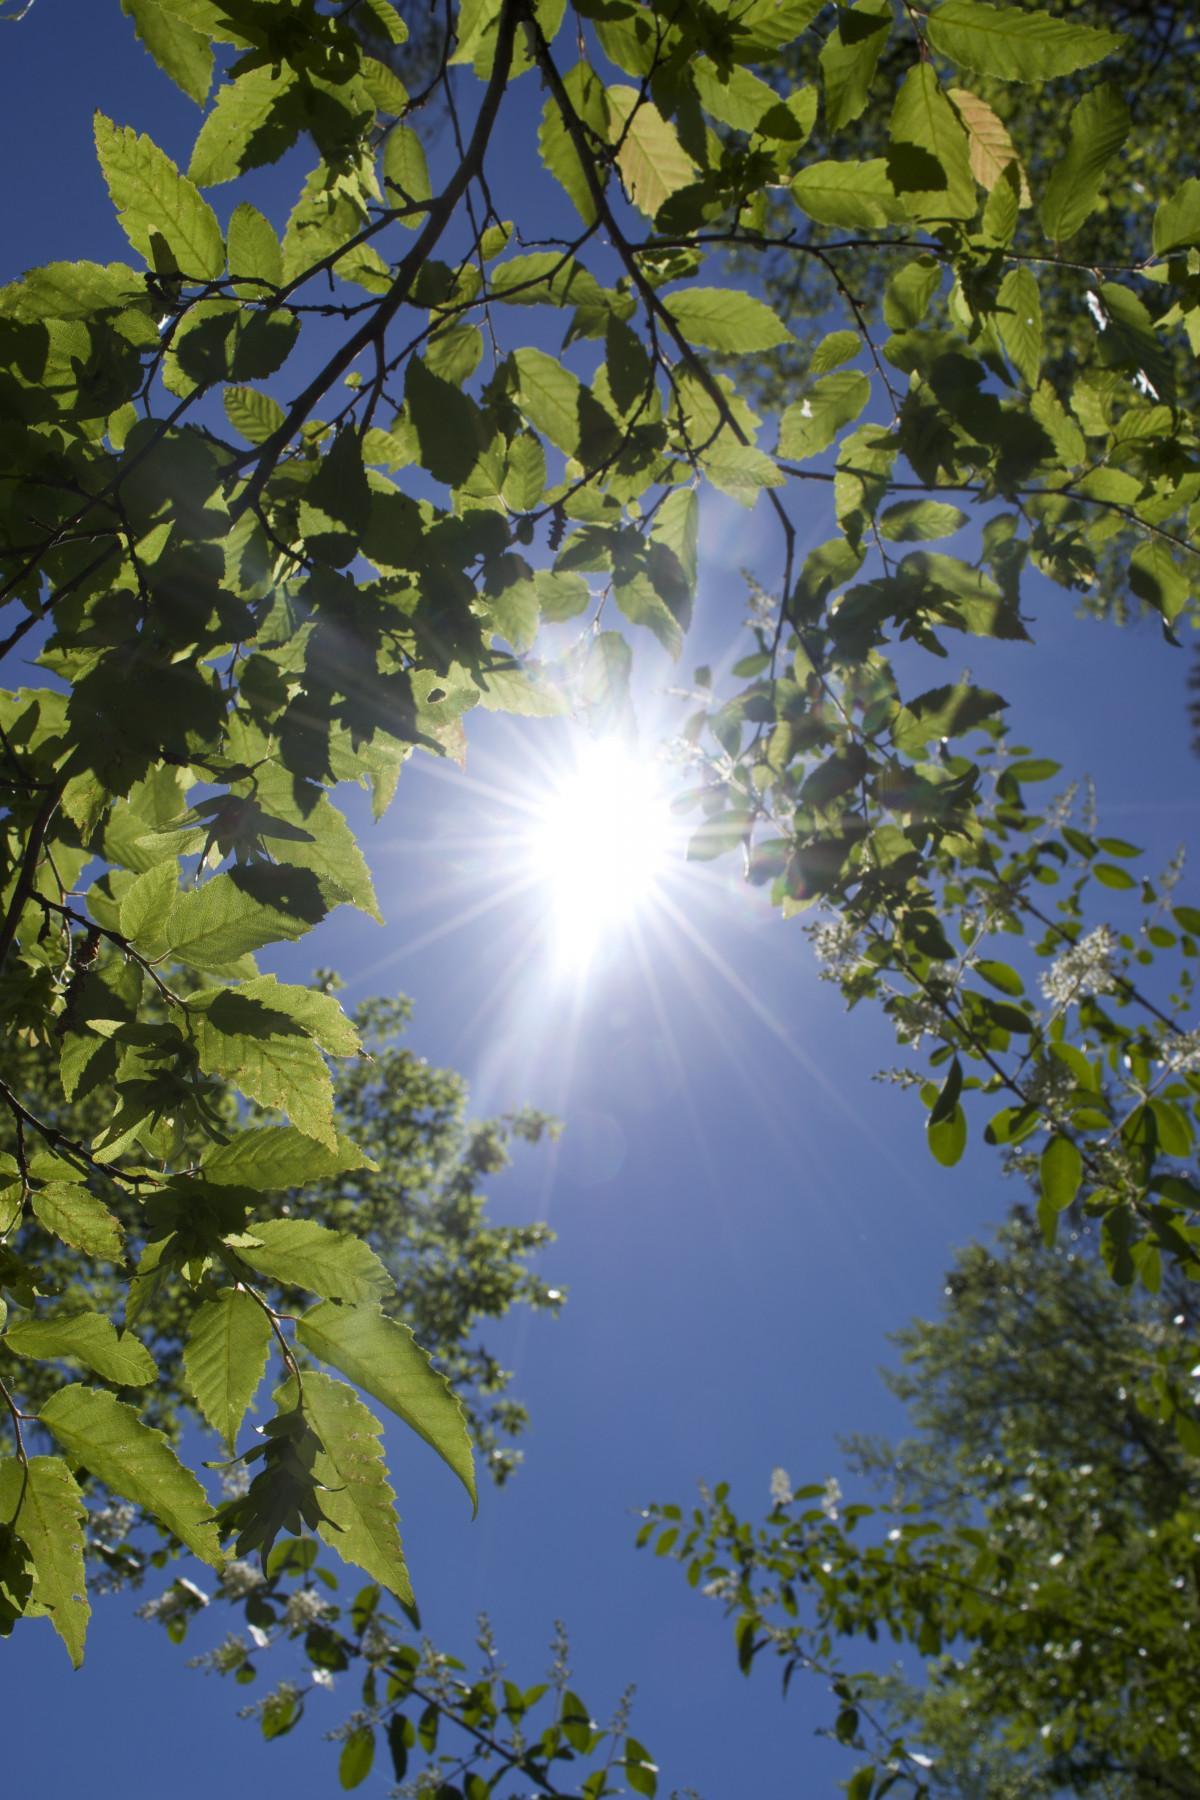 Fall Season Wallpaper Free Free Images Landscape Tree Forest Plant Sky Lane